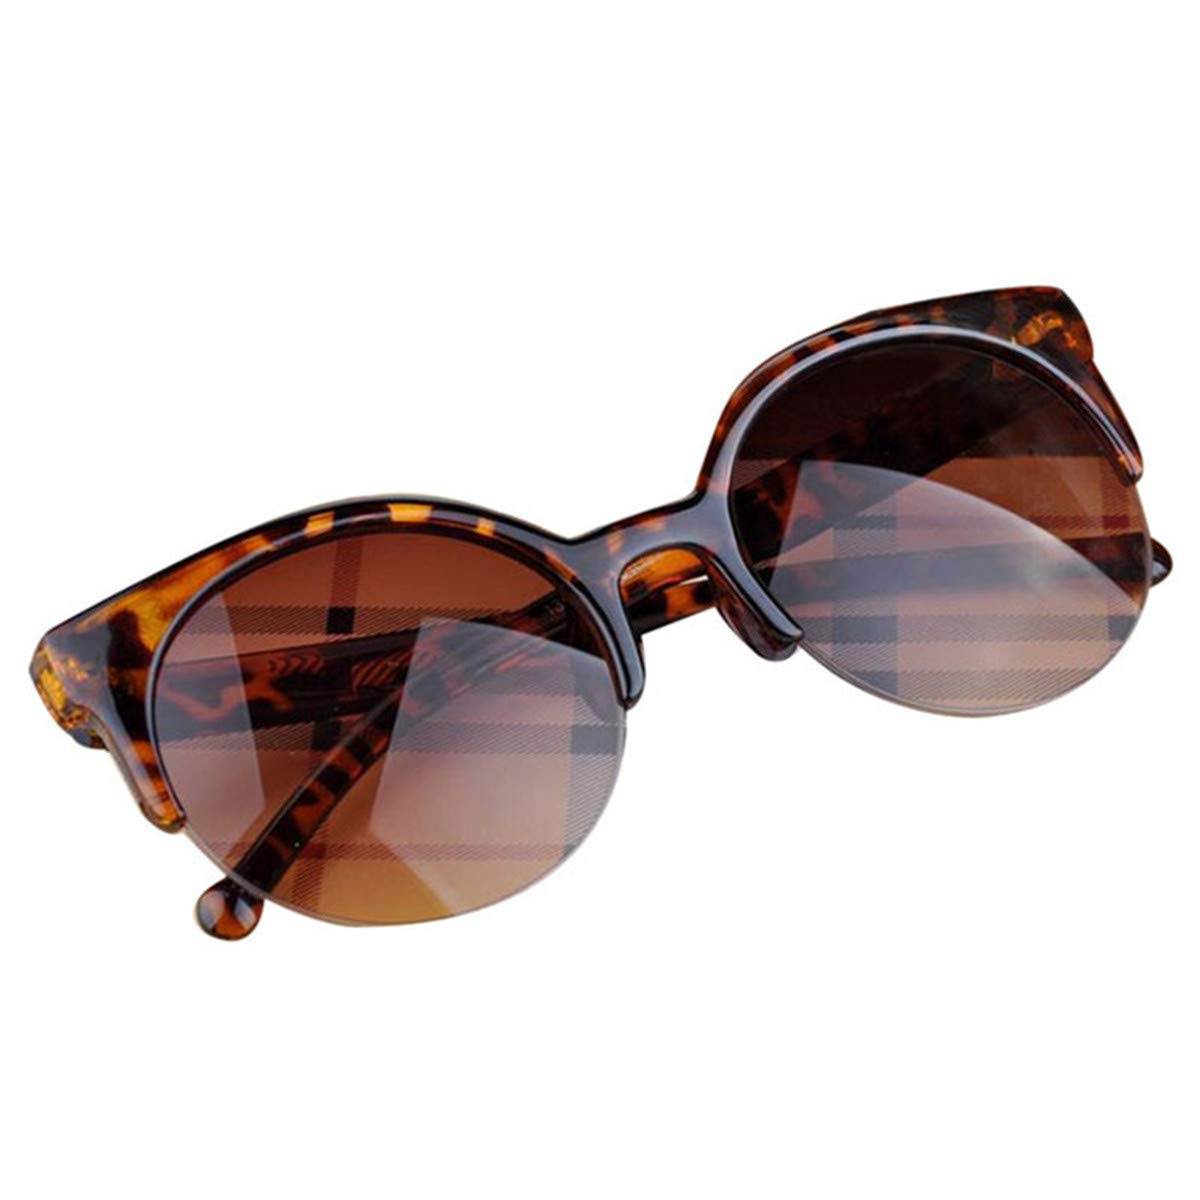 Amazon.com: Fainosmny - Gafas unisex para hombre y mujer ...